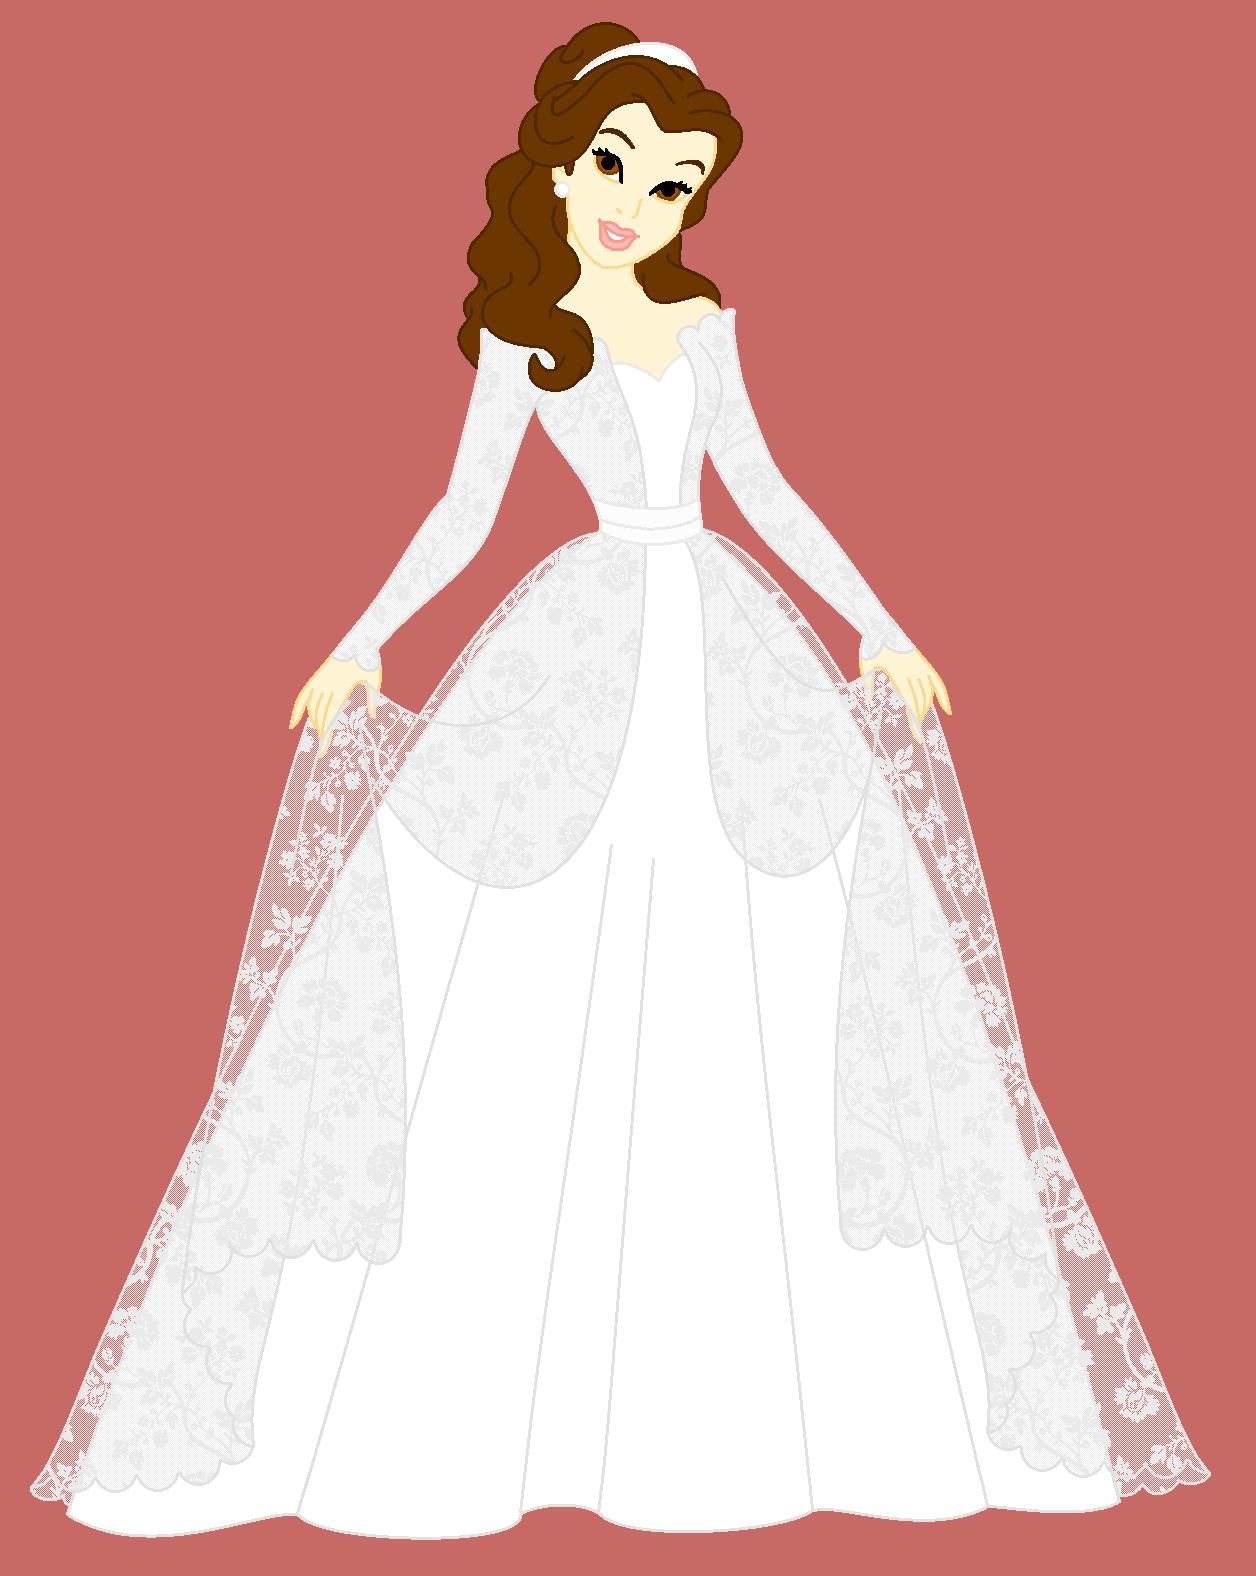 Disney Brides Belle By Milafrancine On Deviantart Disney Bride Disney Princess Wedding Disney Dresses [ 1576 x 1256 Pixel ]